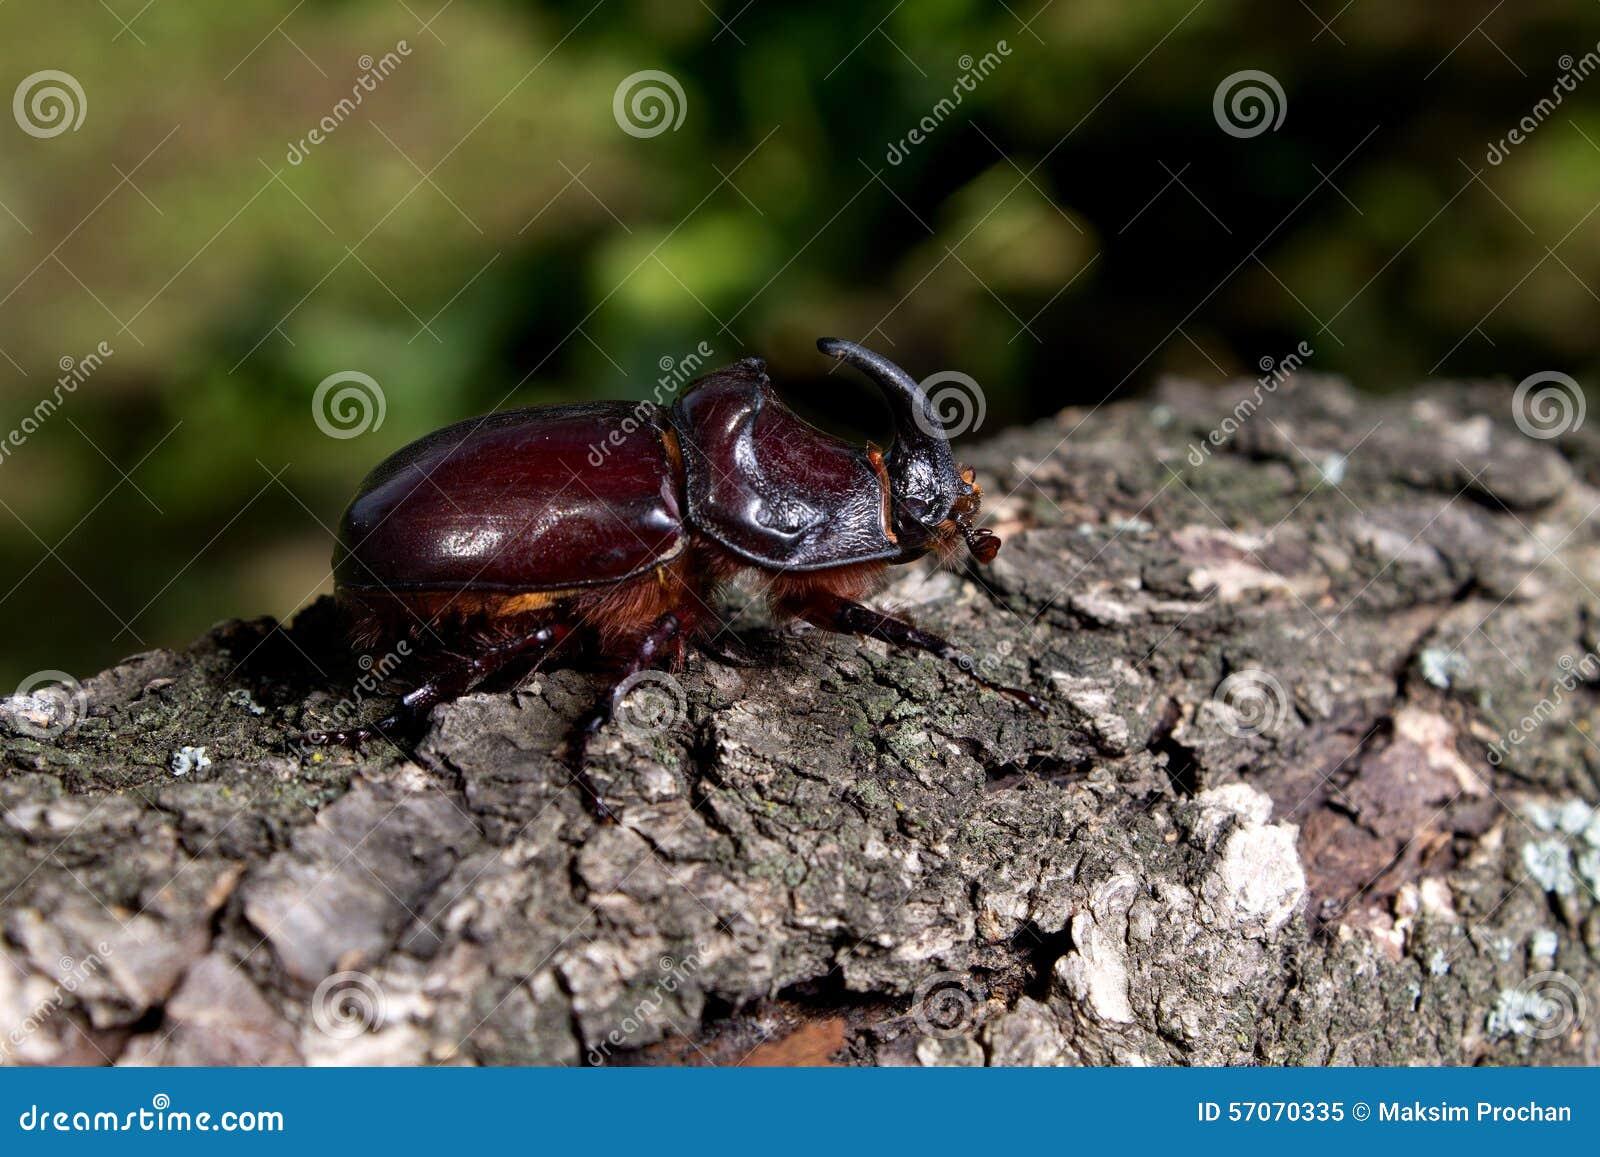 Bruine rinoceroskever die op hout kruipen